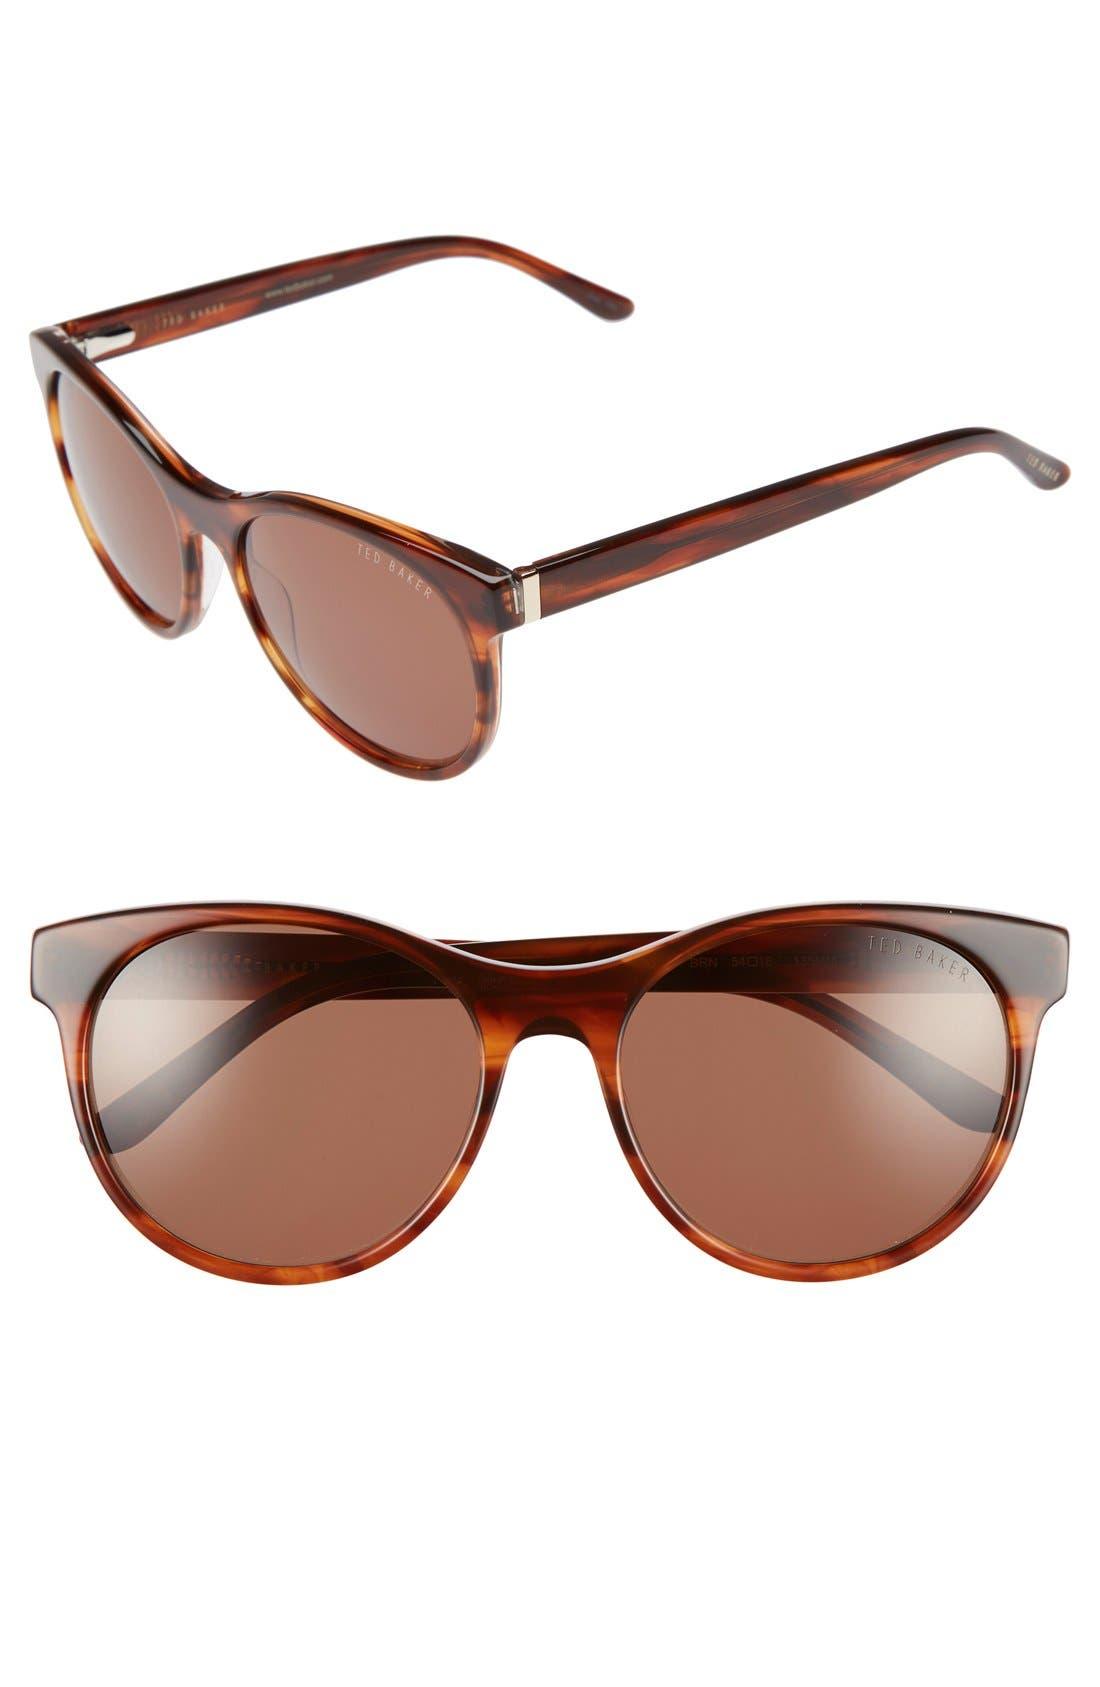 54mm Retro Sunglasses,                             Main thumbnail 4, color,